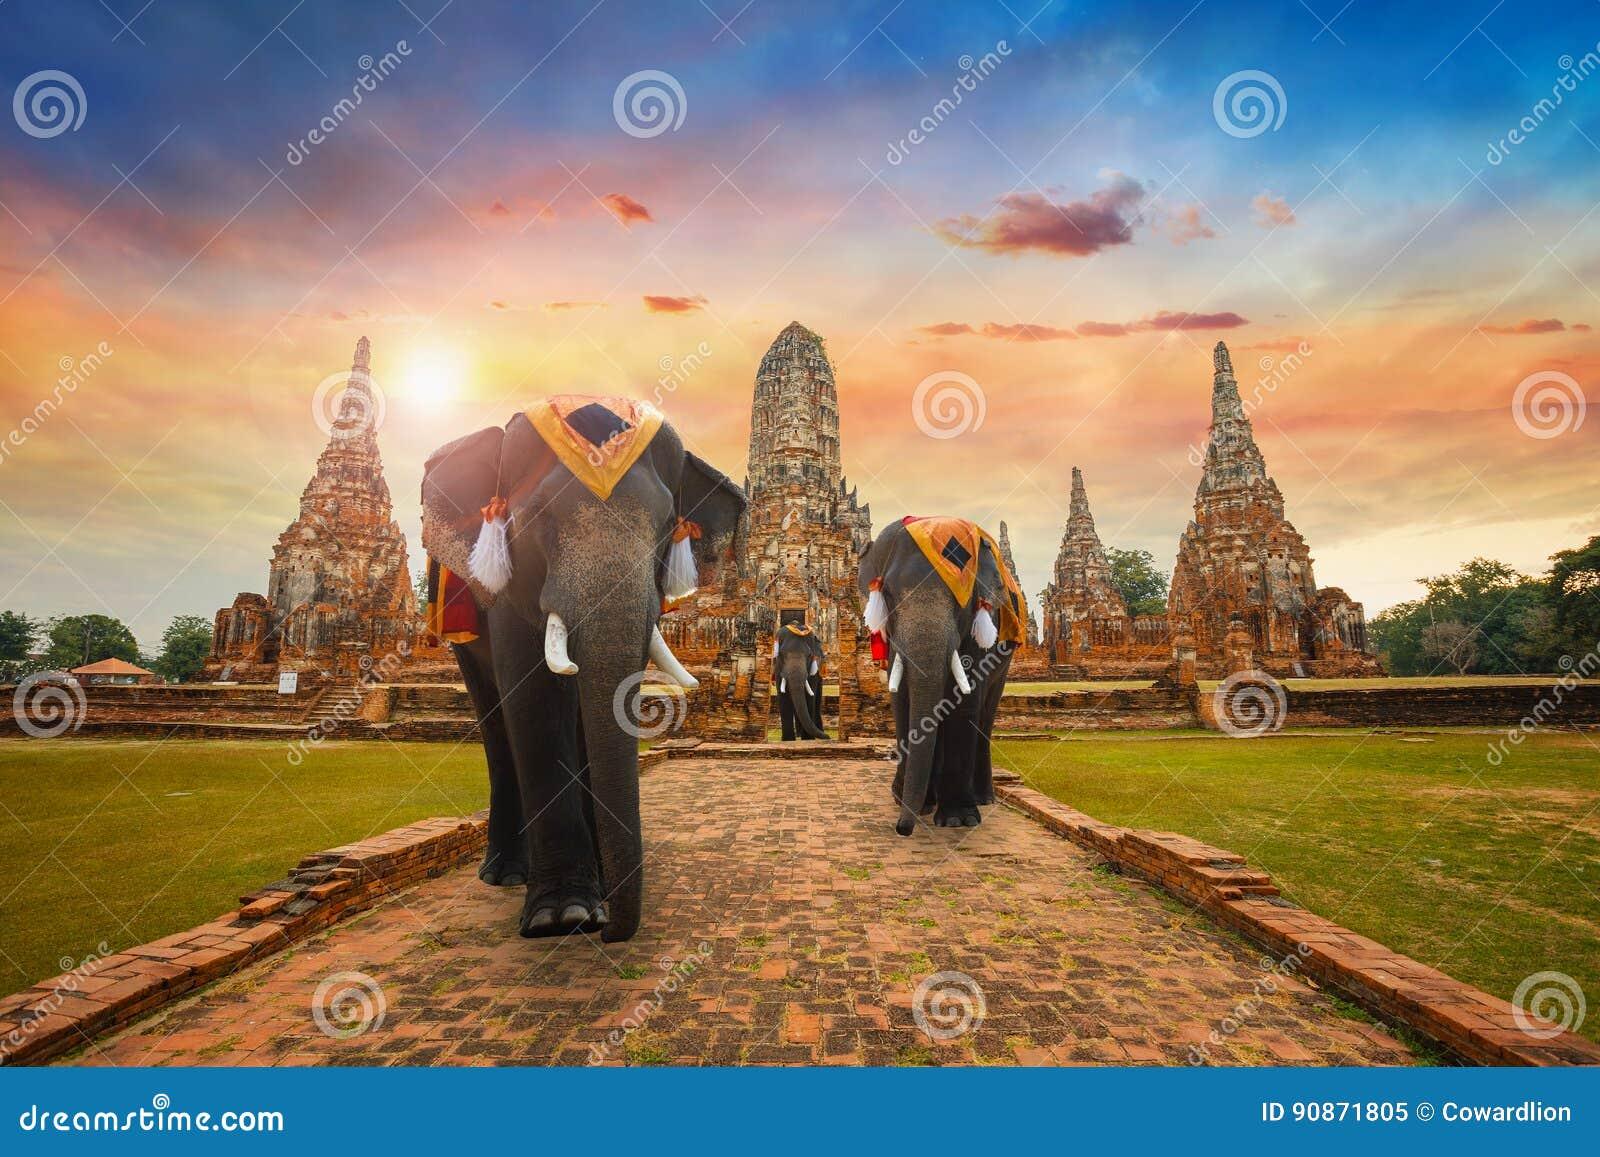 Elephants at Wat Chaiwatthanaram temple in Ayuthaya